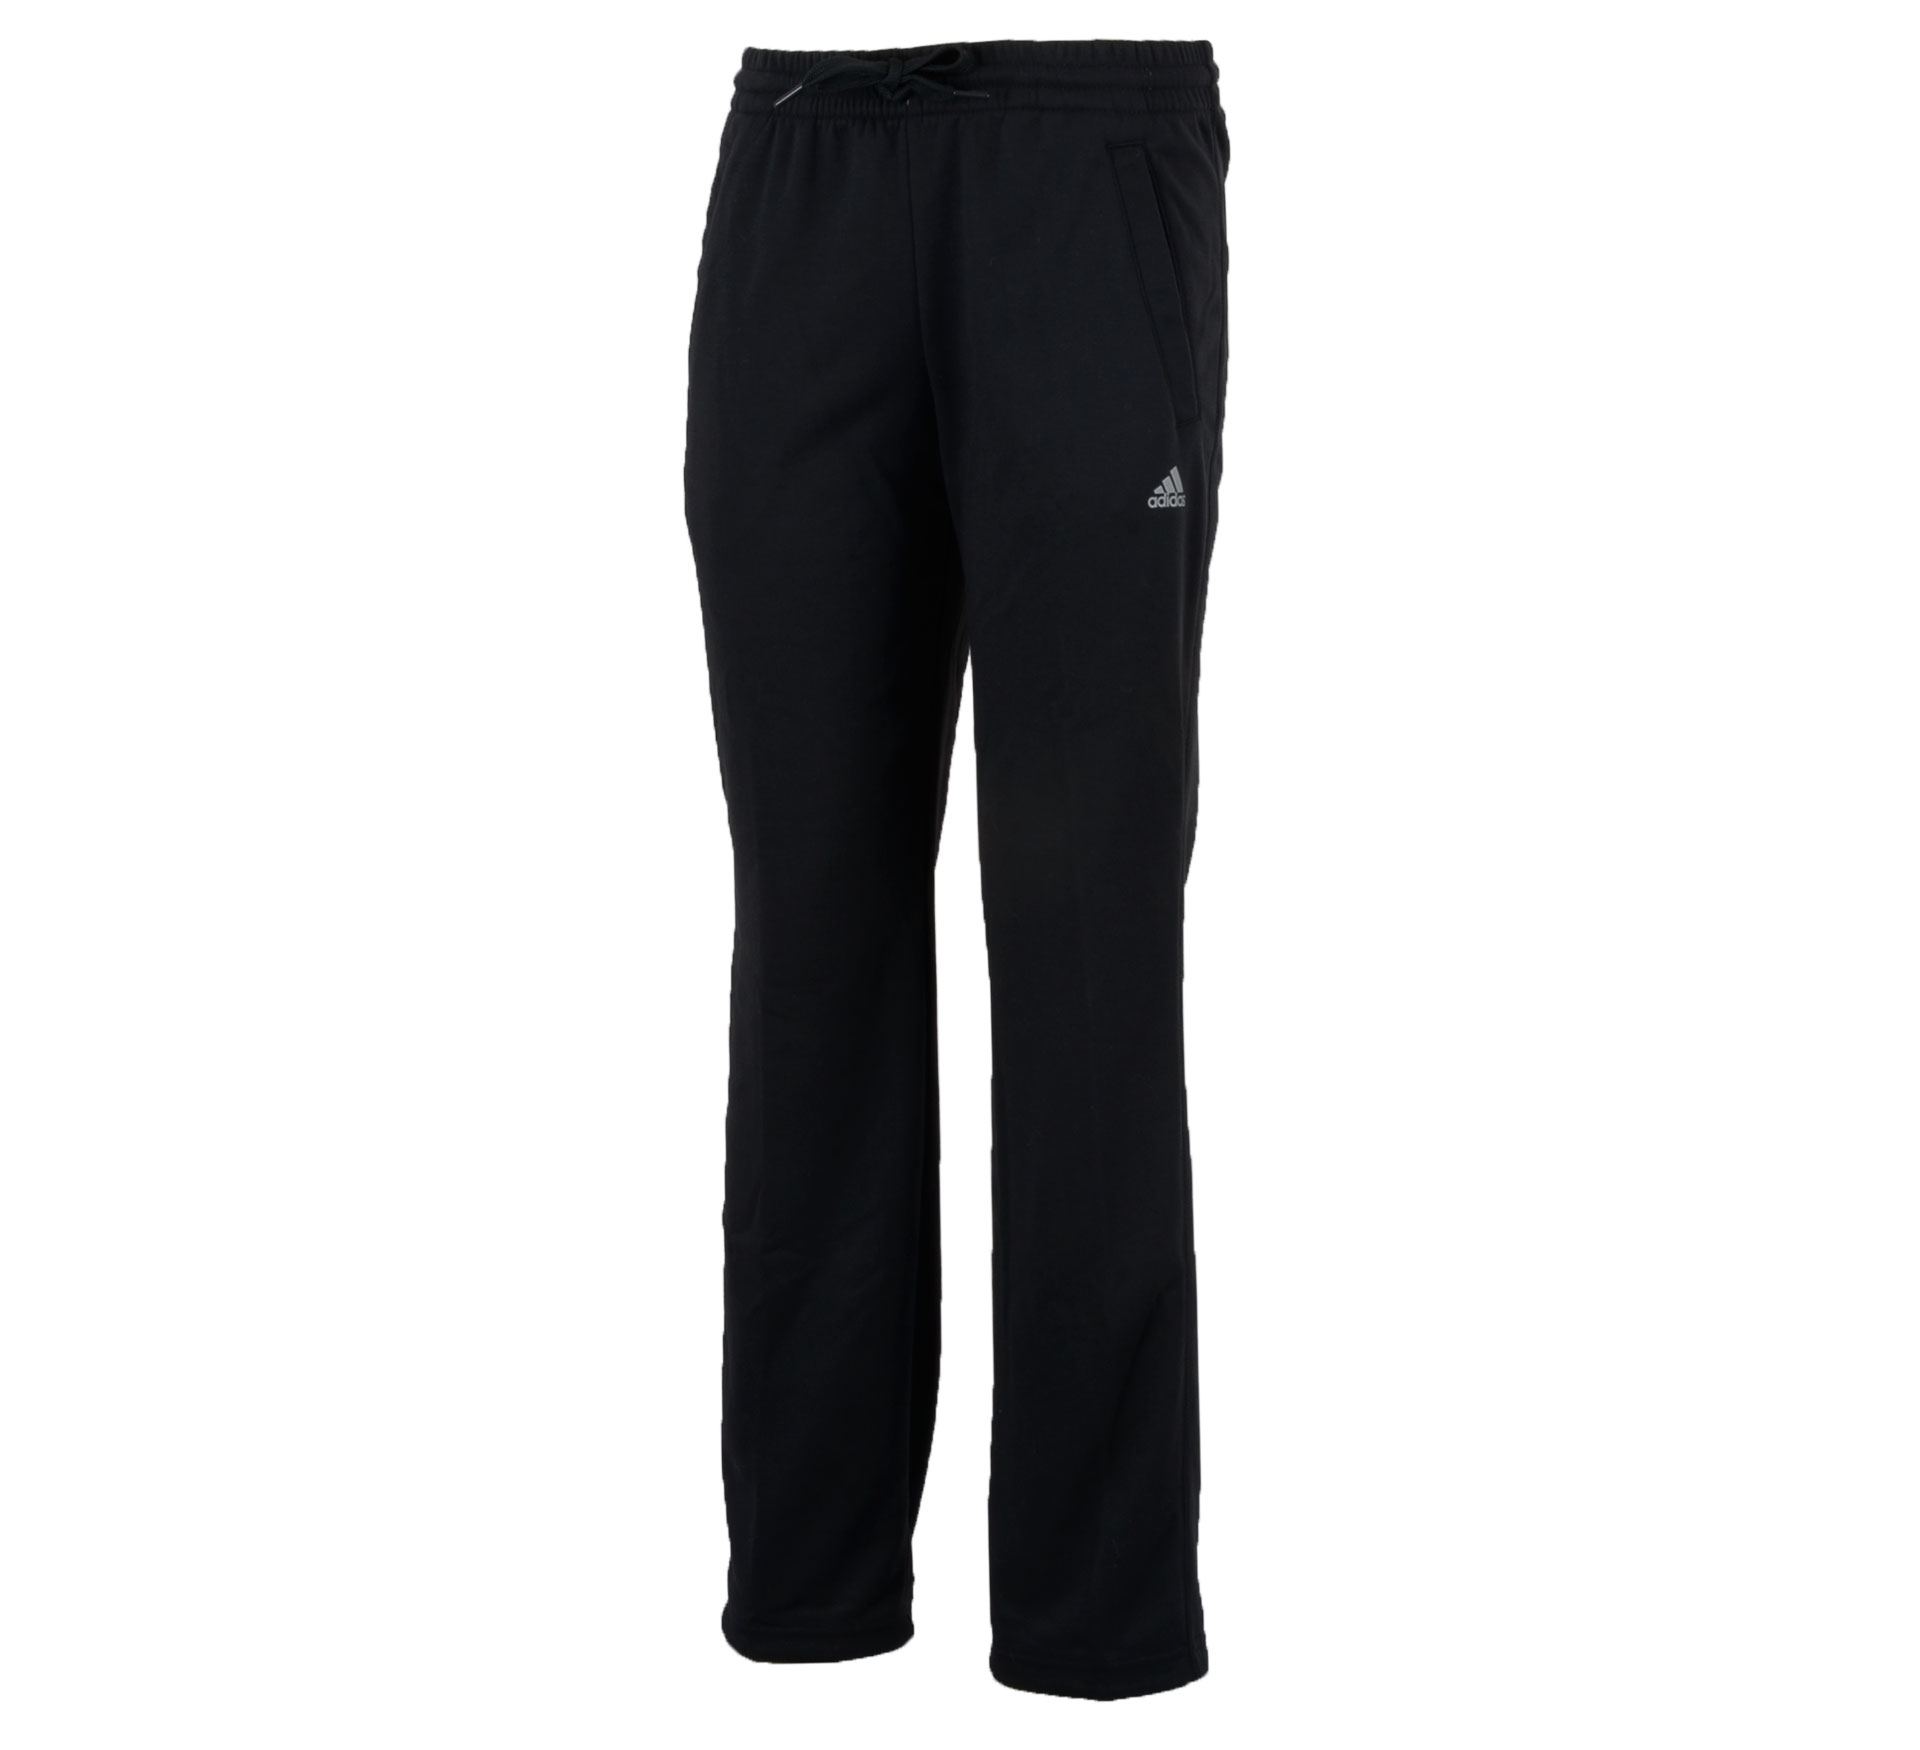 Adidas Prime Trainingsbroek Dames zwart